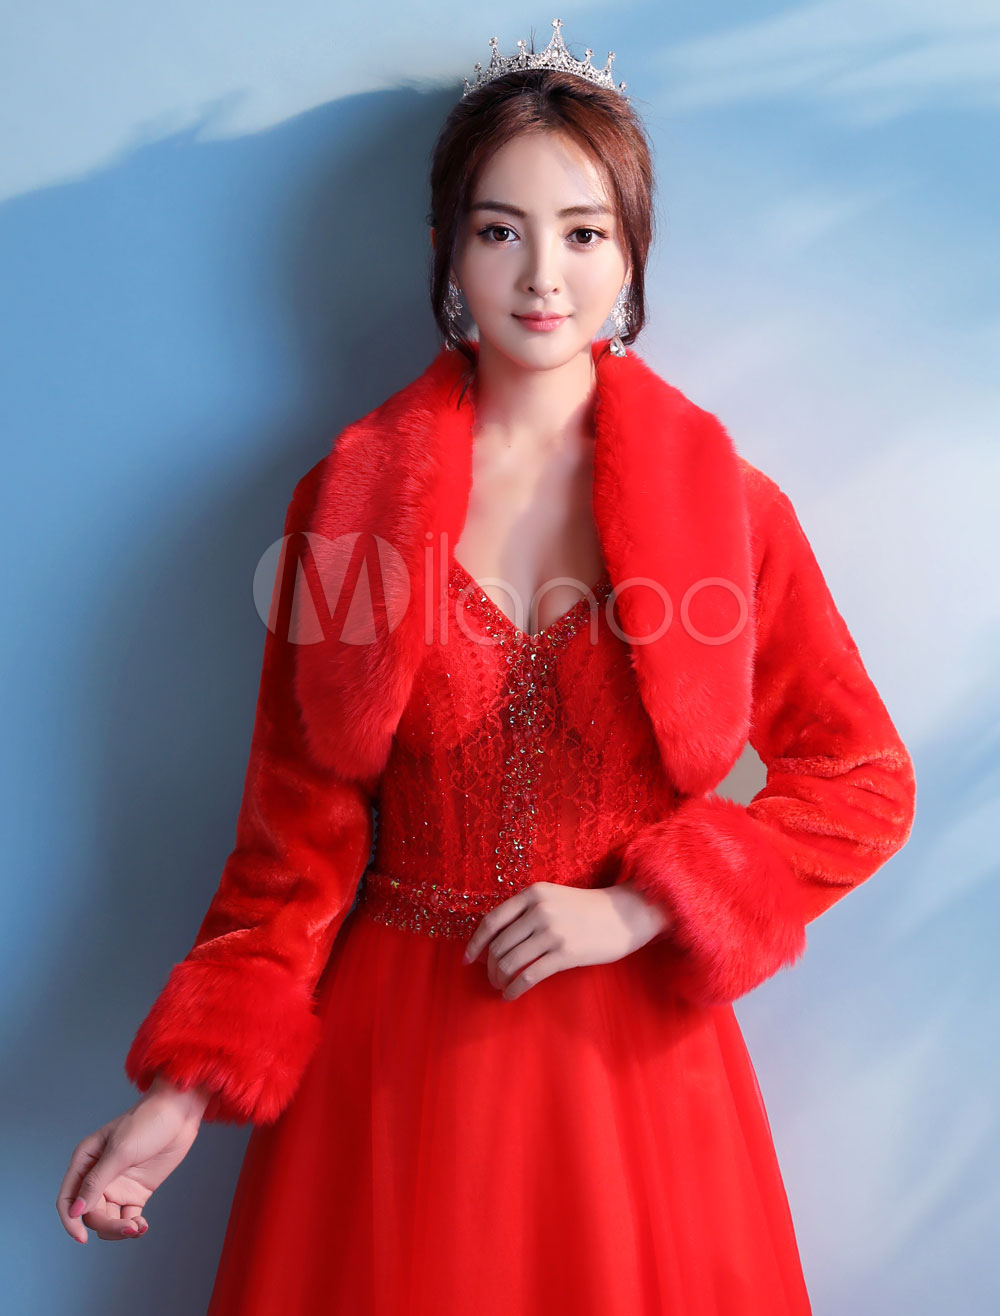 ef1dff10df4fa Wedding Bolero Jacket Faux Fur Red Long Sleeve Bridal Shrug Party Cover  Ups-No. 12. 32%OFF. Color:Red